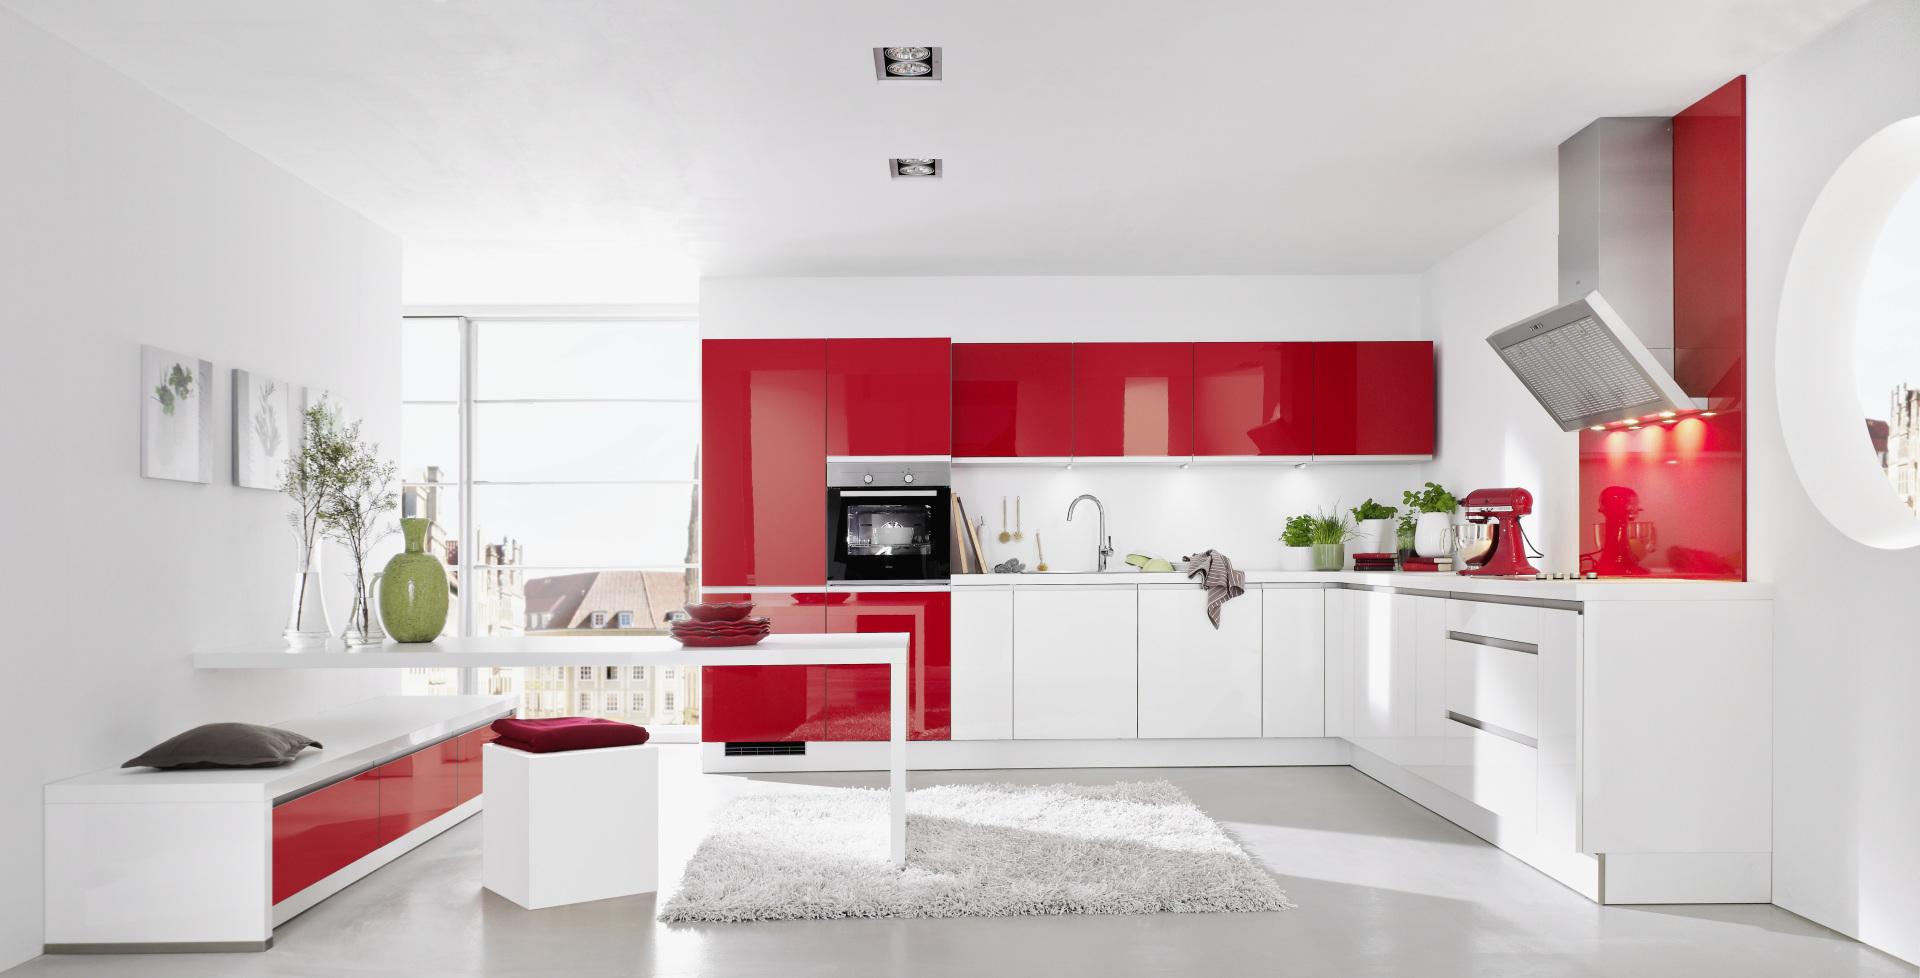 Nolte Keukens Rotterdam - Trend-Lack - softmat - Rood-Wit